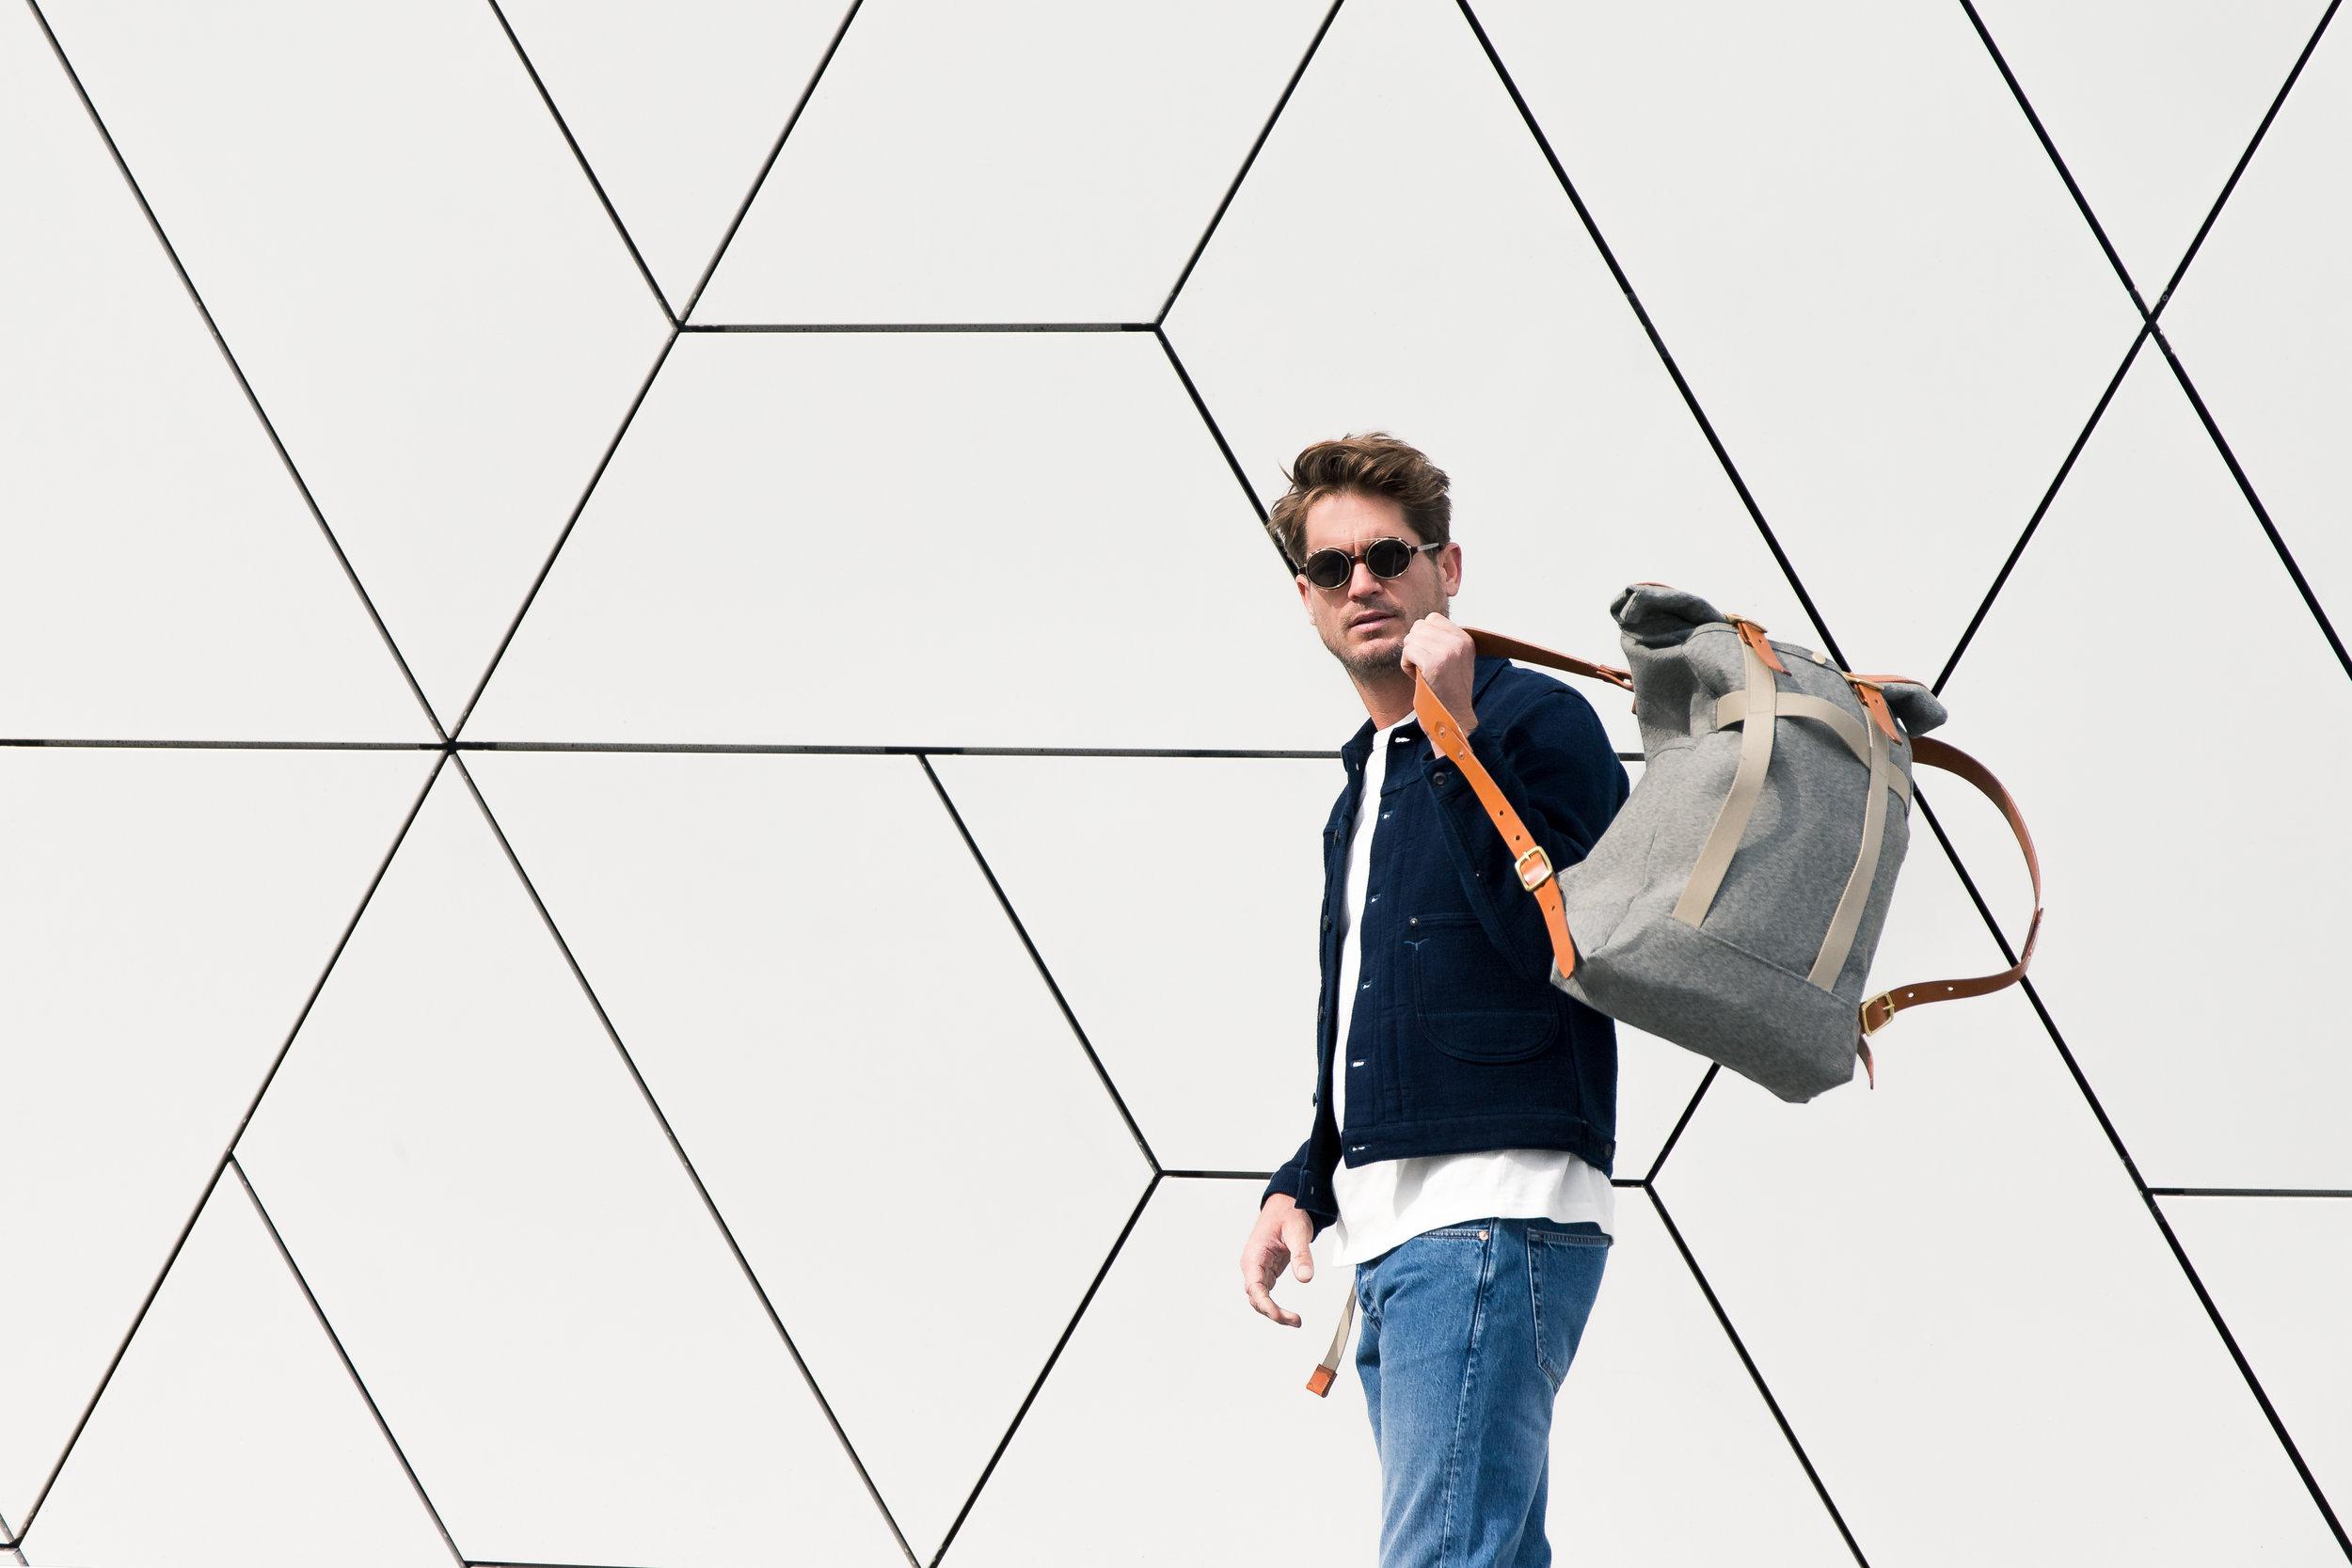 Bag:  Dyemond Goods Outland backpack // Belt: Dyemond Goods Woven belt //Jacket: BENZAK jacket (Launching FW18)// Top:  BENZAK BT-01 pocket tee //Jeans:  BENZAK B-01 slim Medium stone //Specs:  Han Kjobenhavn Doc Clip on Amber